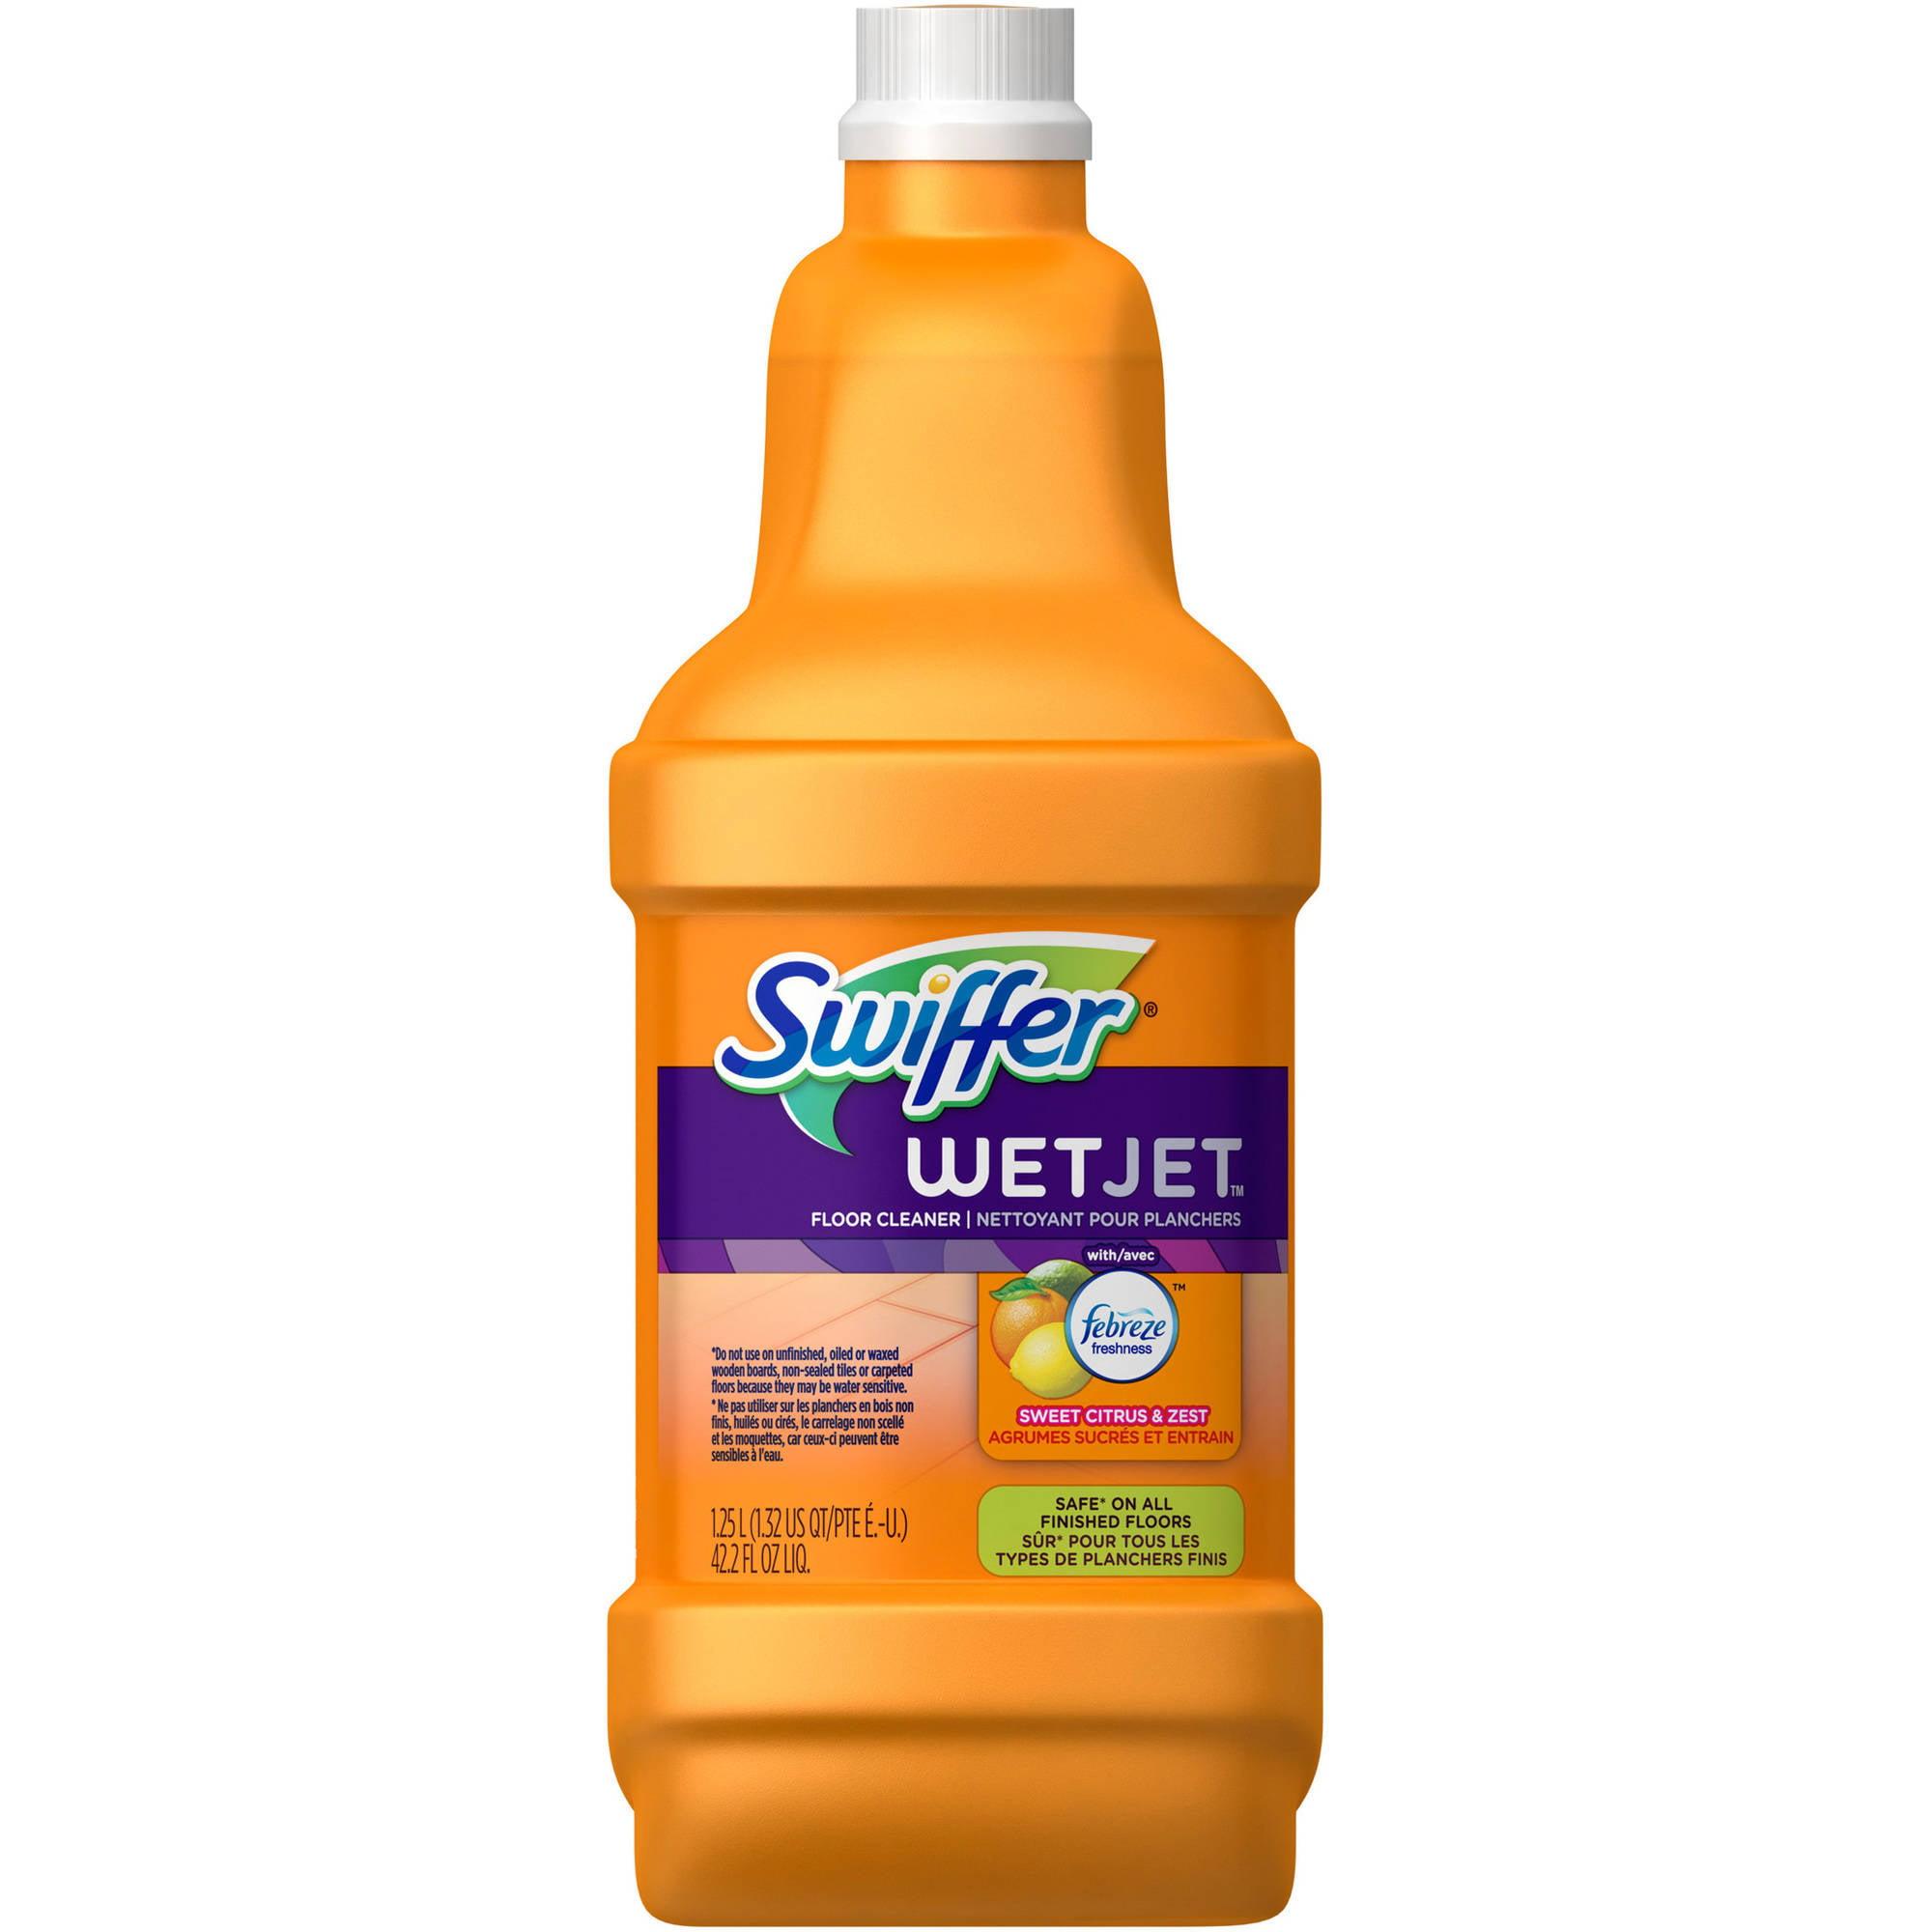 Swiffer wetjet wood floor cleaner - Swiffer Wetjet Wood Floor Cleaner 3